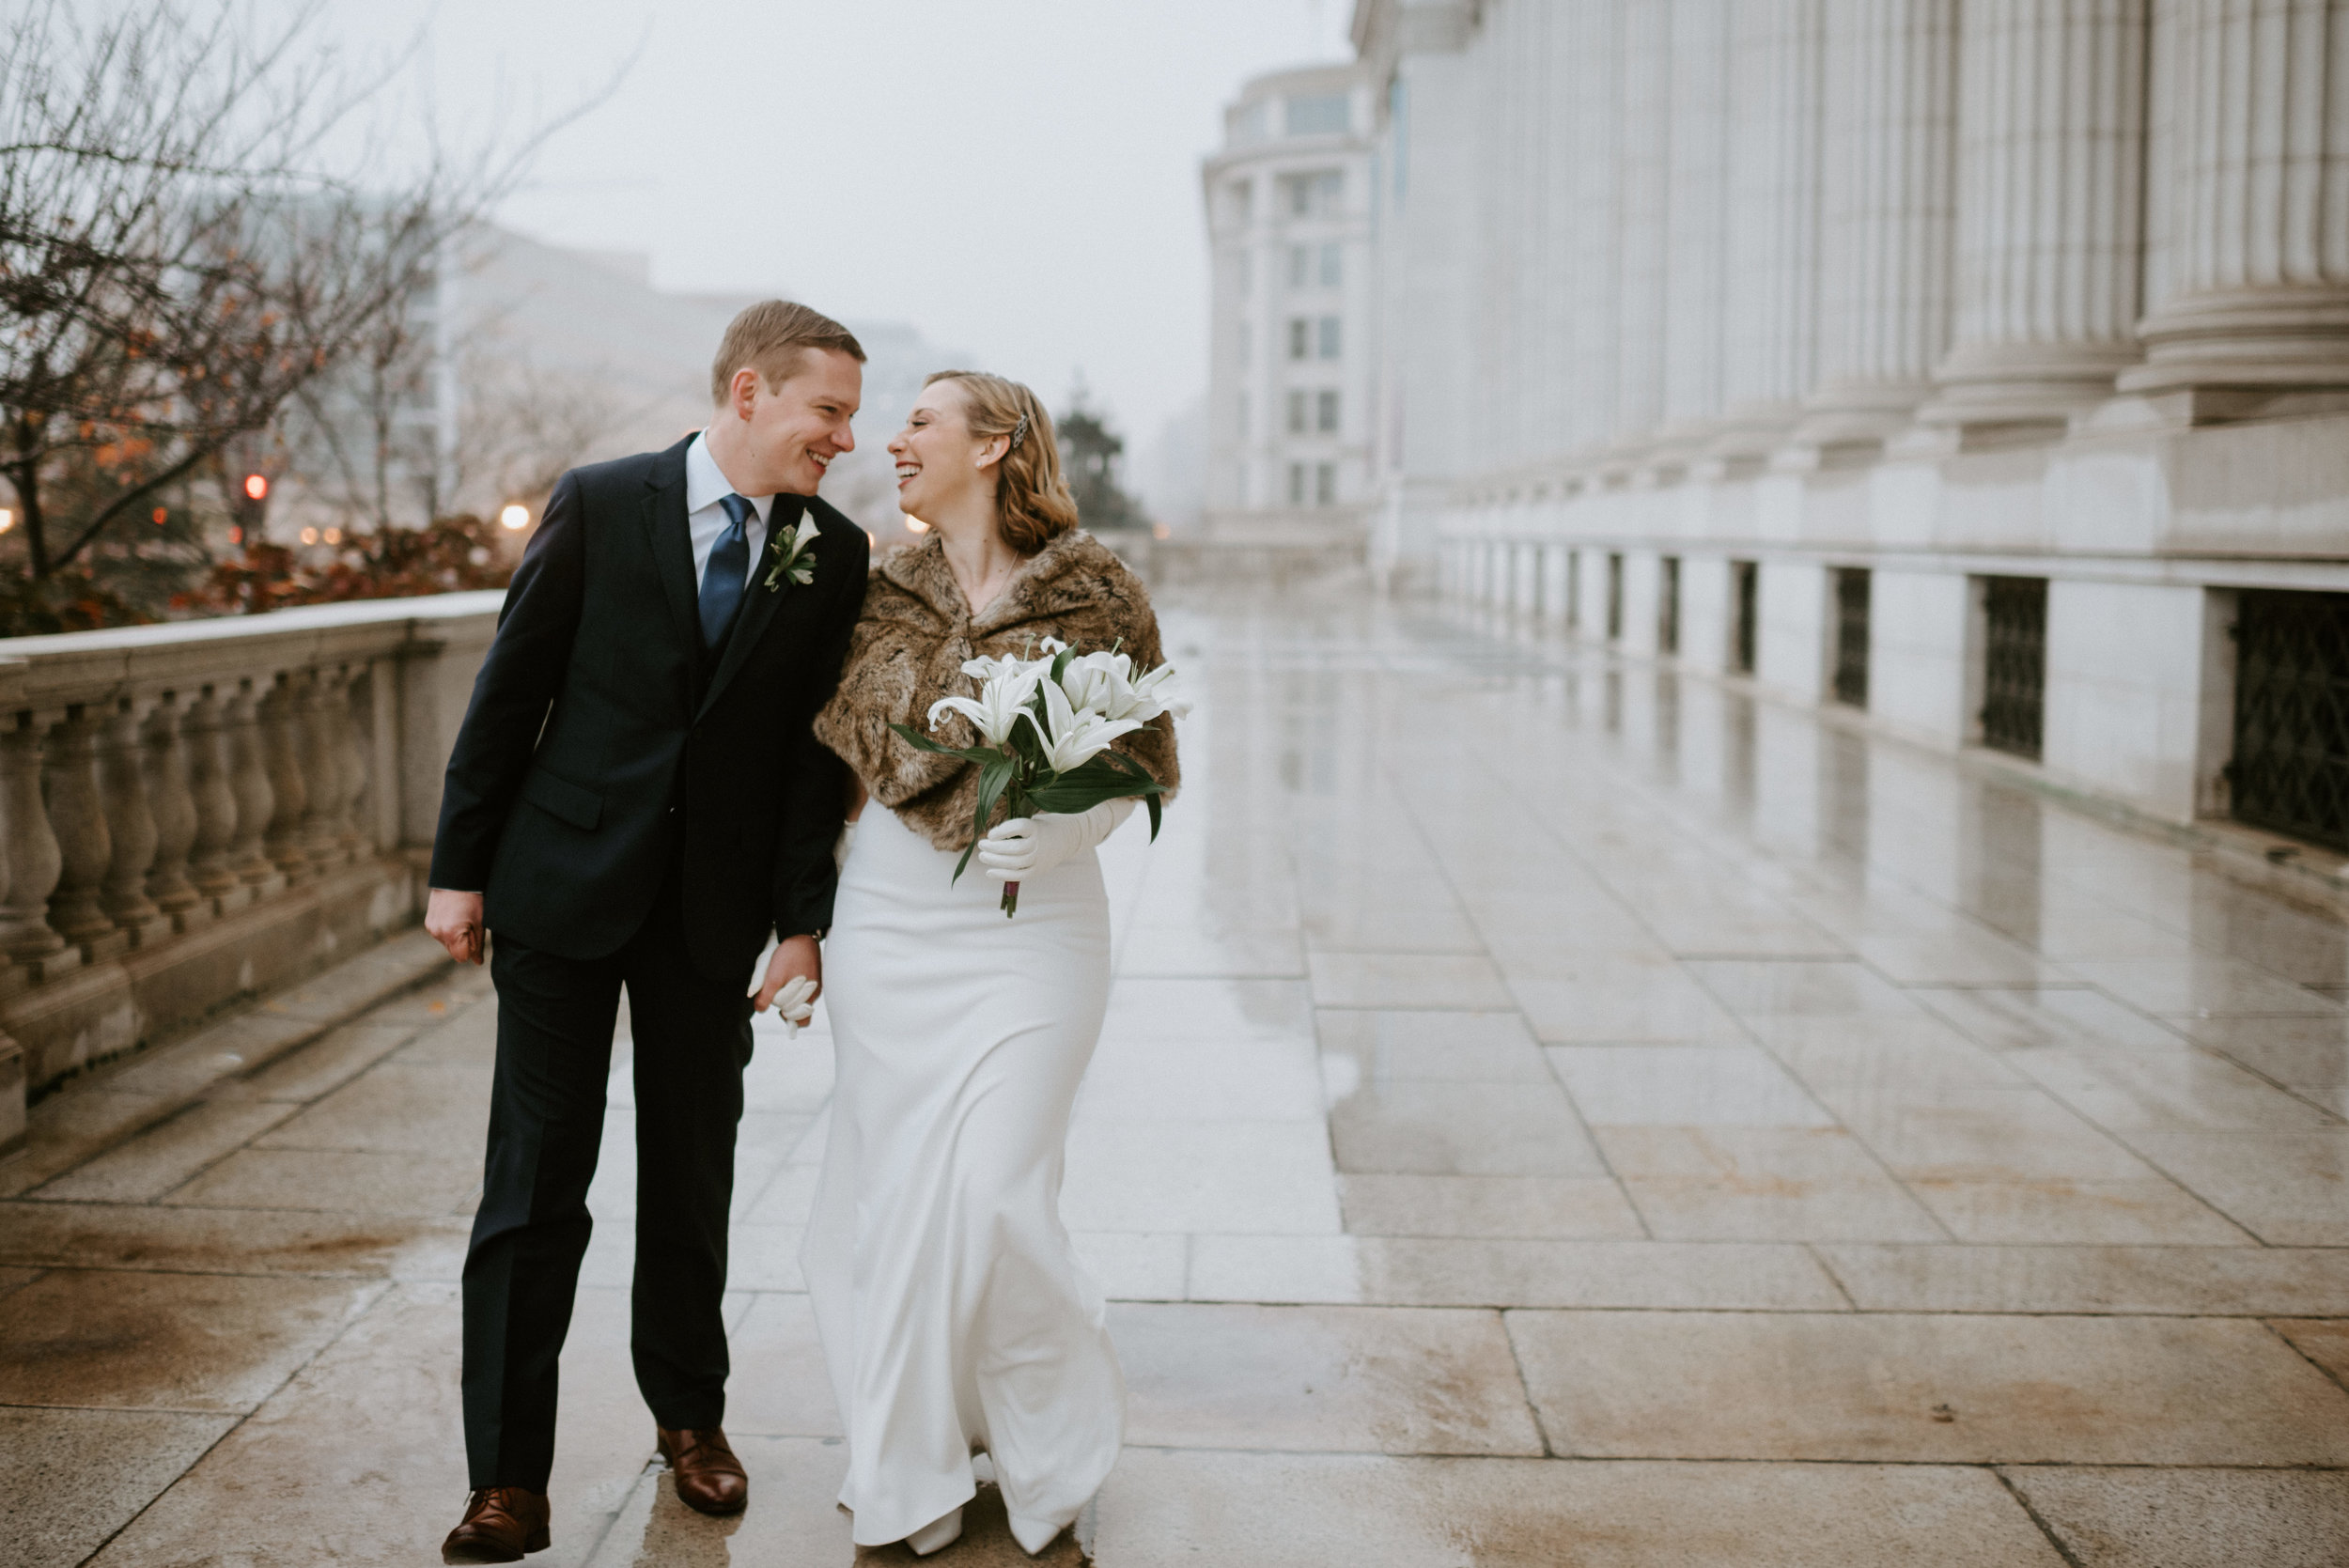 BEST-DC-INTIMATE-WEDDING-PHOTOGRAPHER-MEGAN-GRAHAM-PHOTOGRAPHY4.jpg